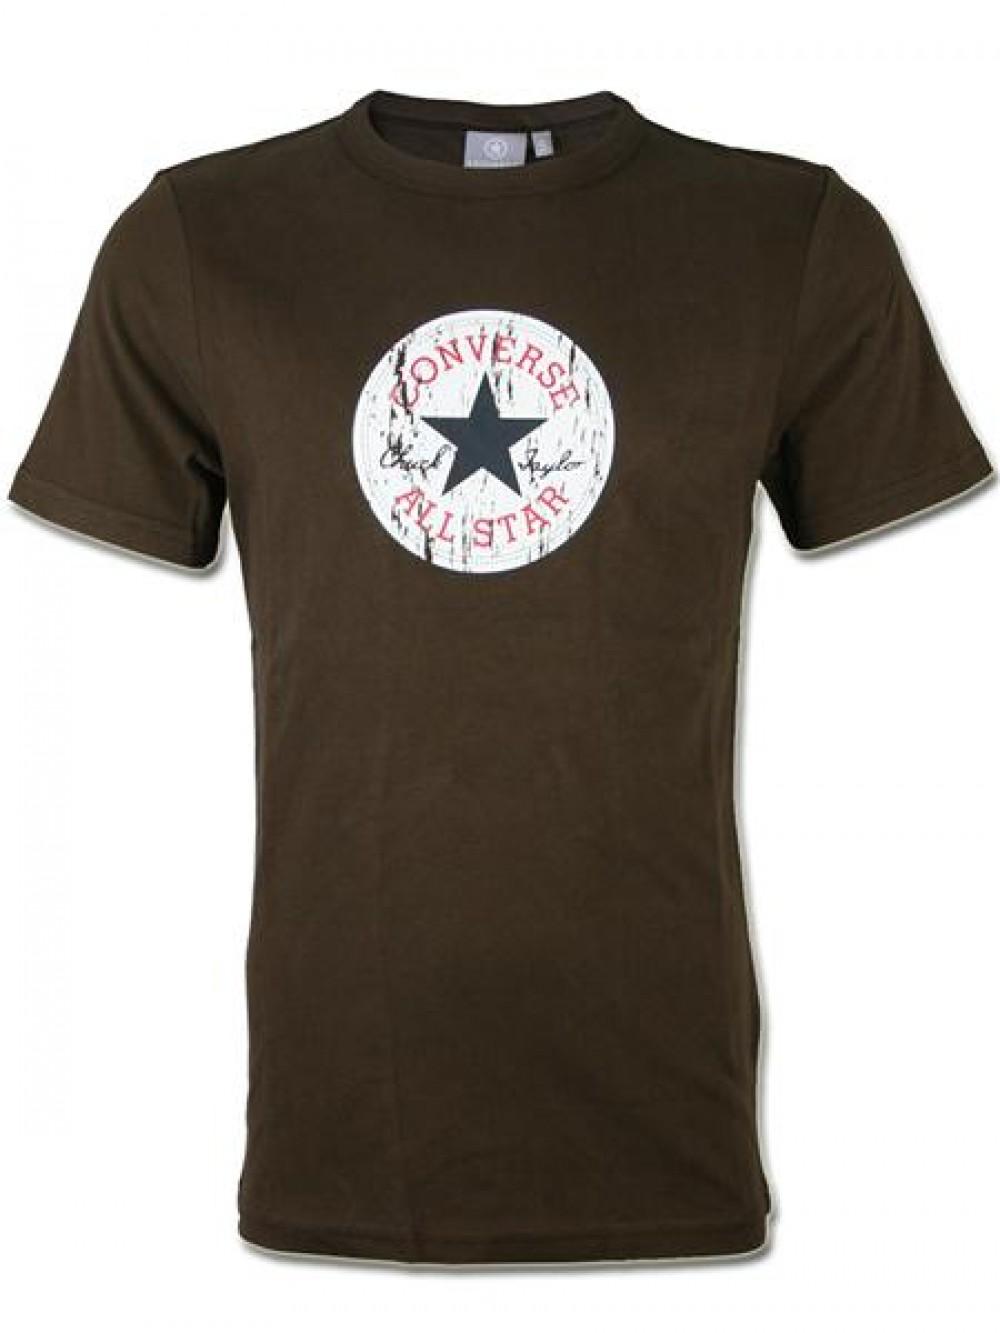 Converse Herren Vintage Shirt Vintage Patch